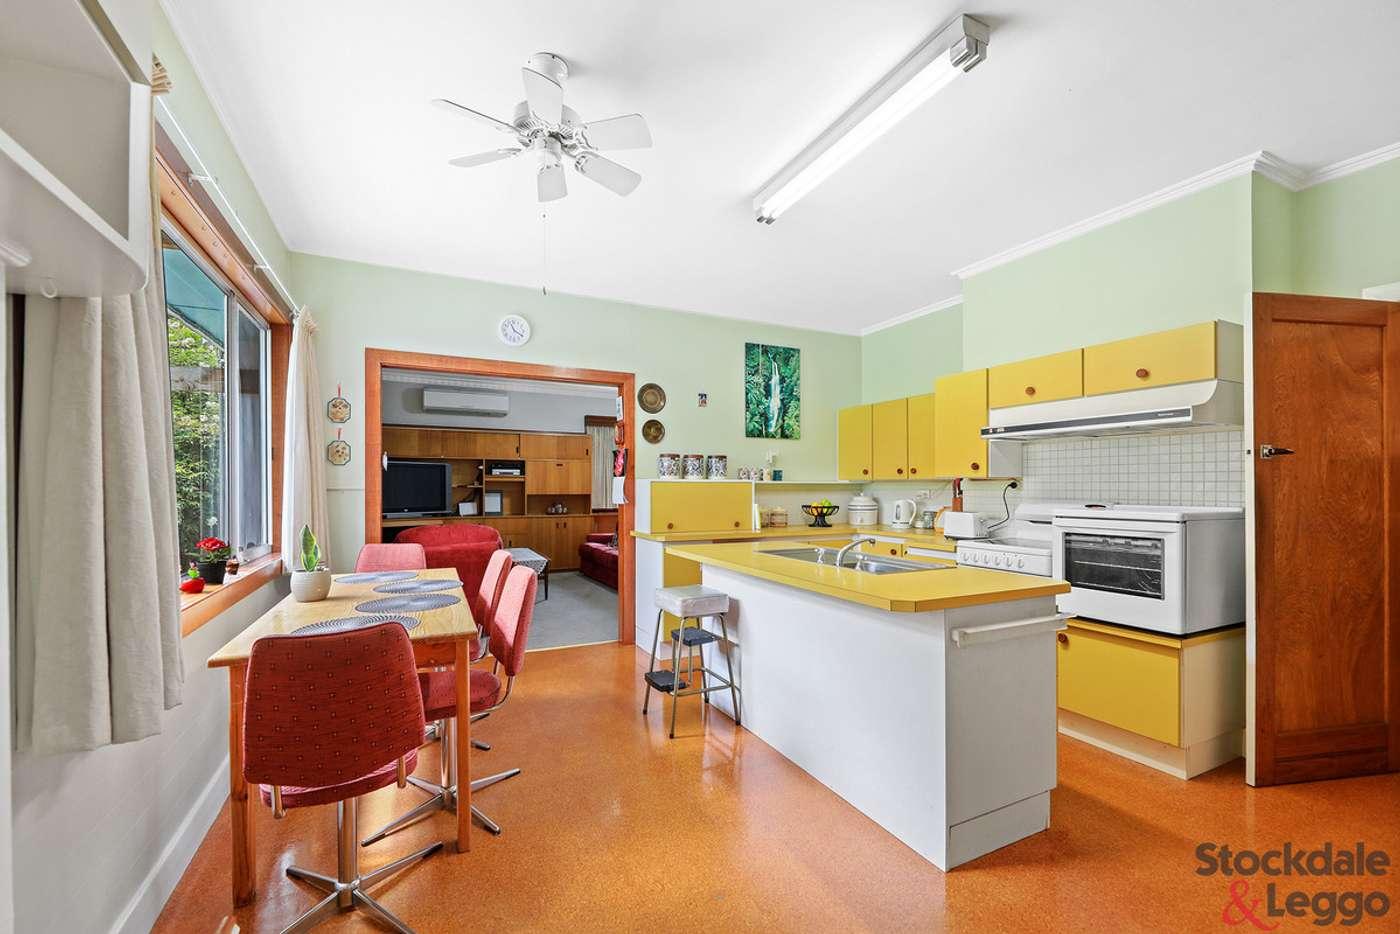 Sixth view of Homely house listing, 75 Becks Bridge Road, Newborough VIC 3825